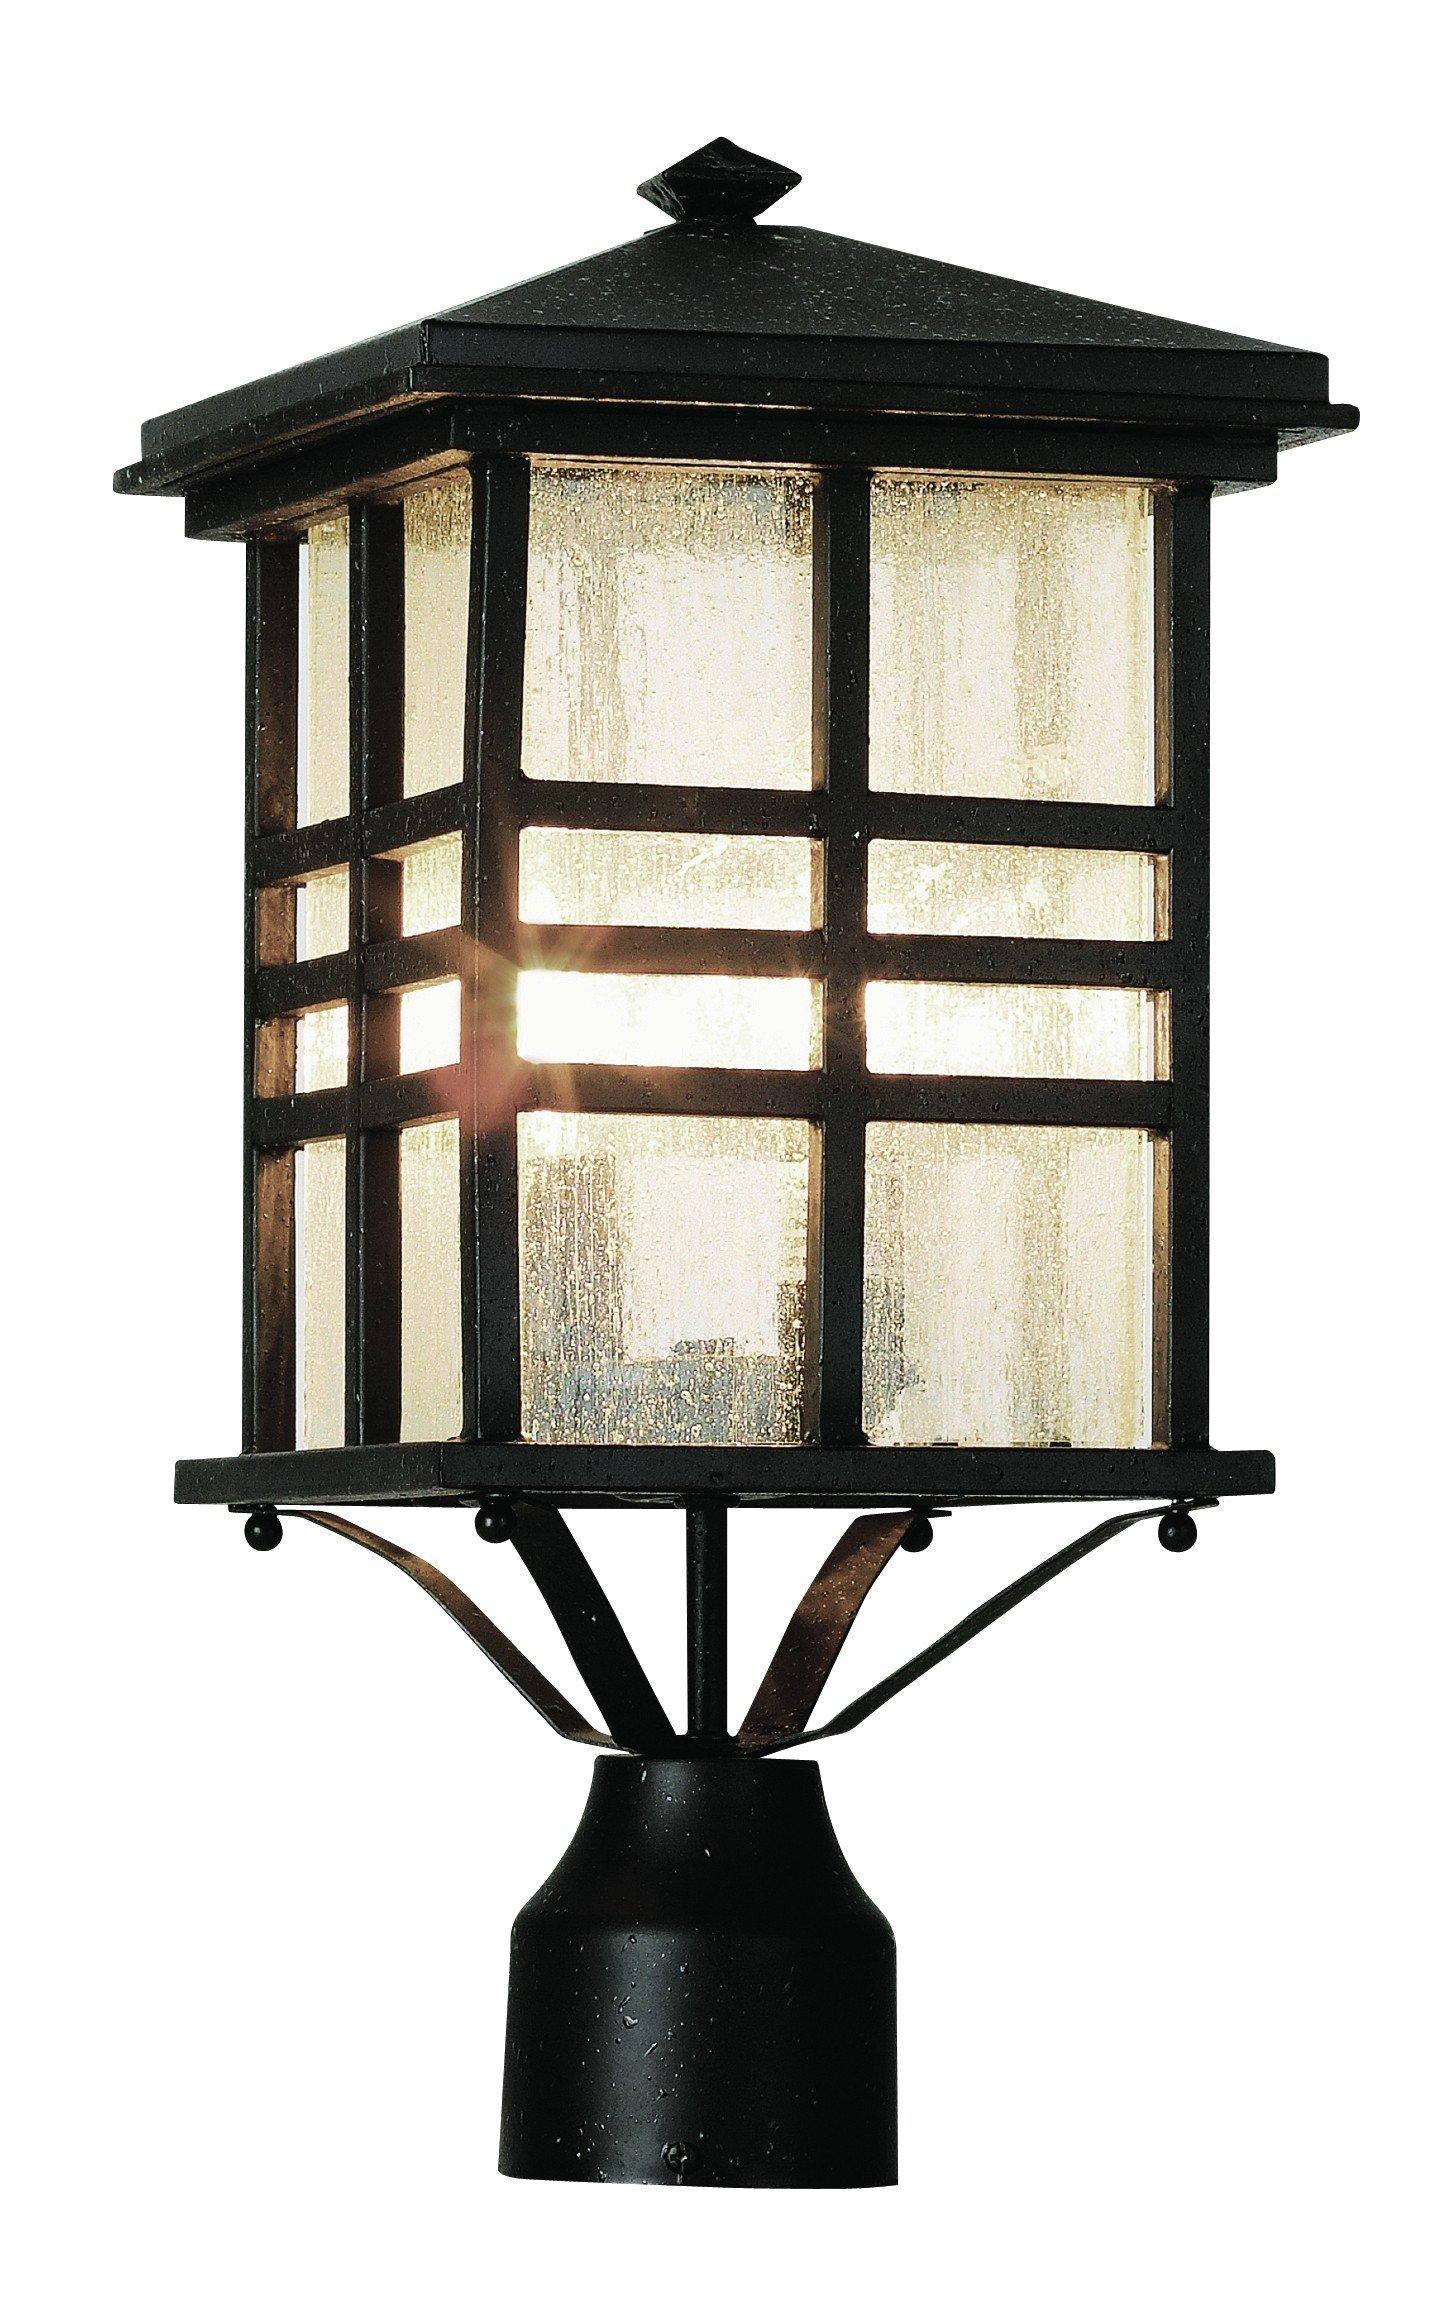 Trans Globe Lighting 4639 BK Outdoor Huntington 16'' Postmount Lantern, Black